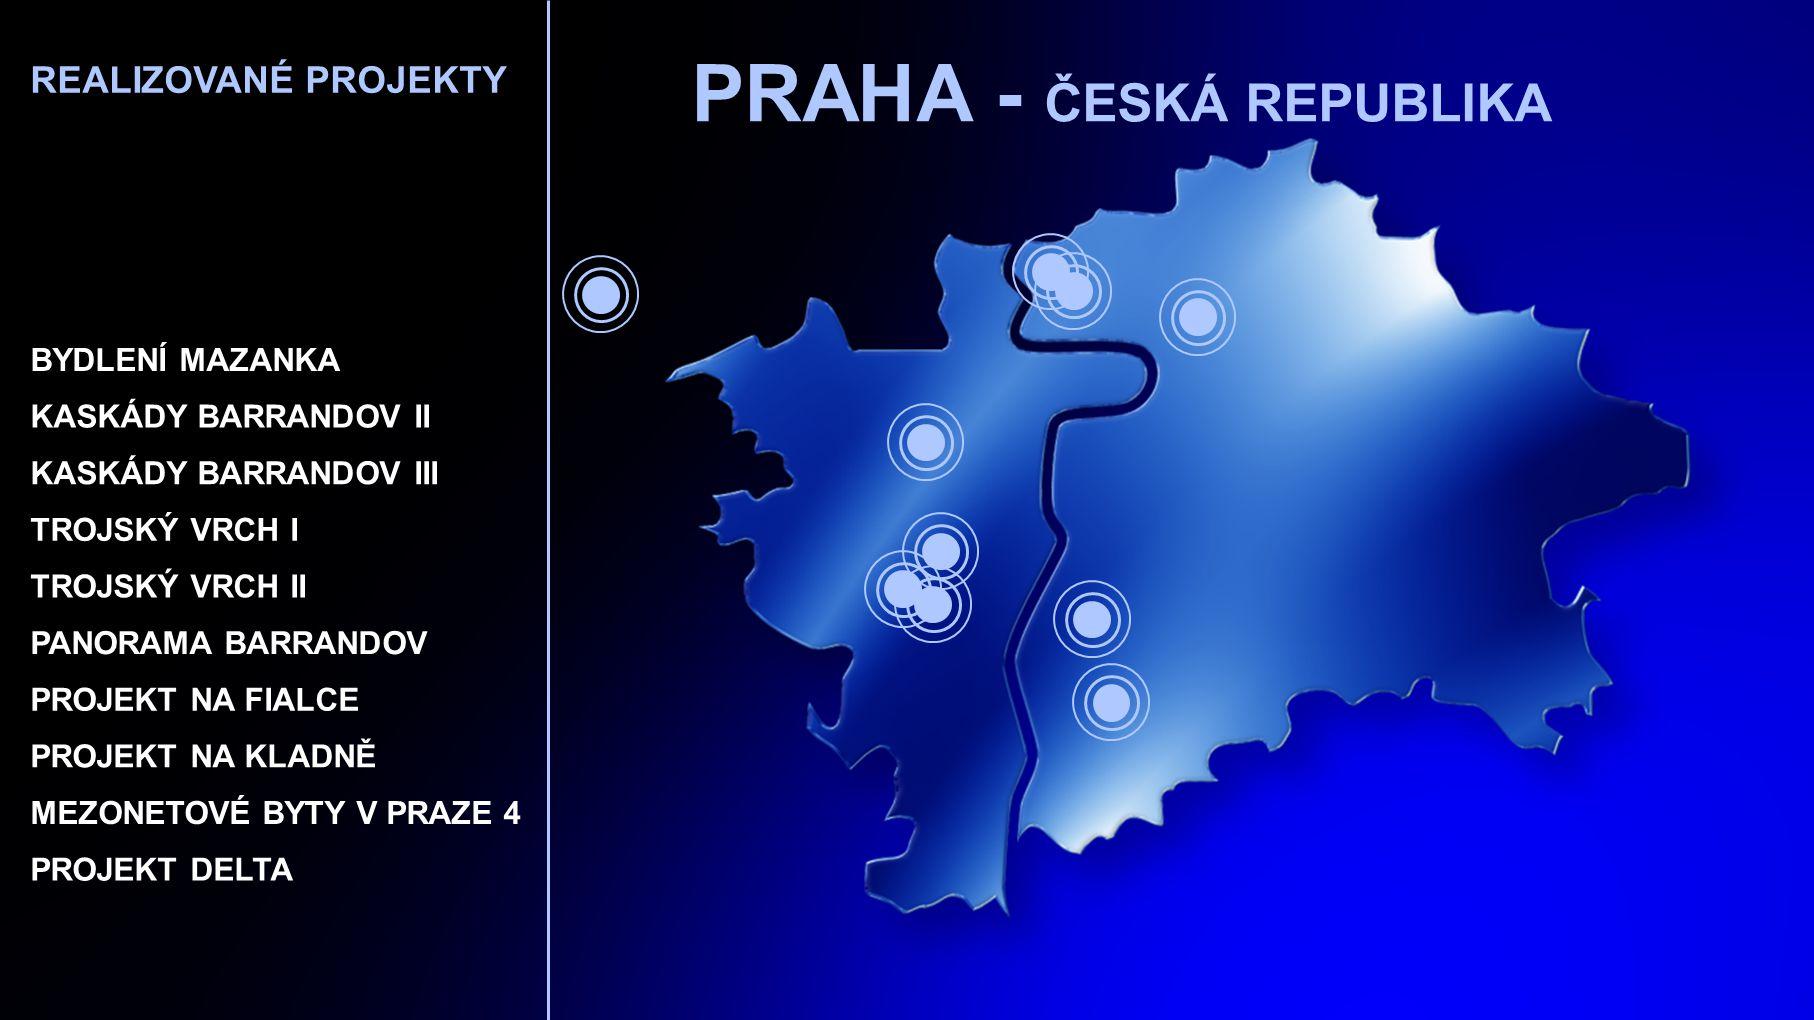 PRAHA - ČESKÁ REPUBLIKA